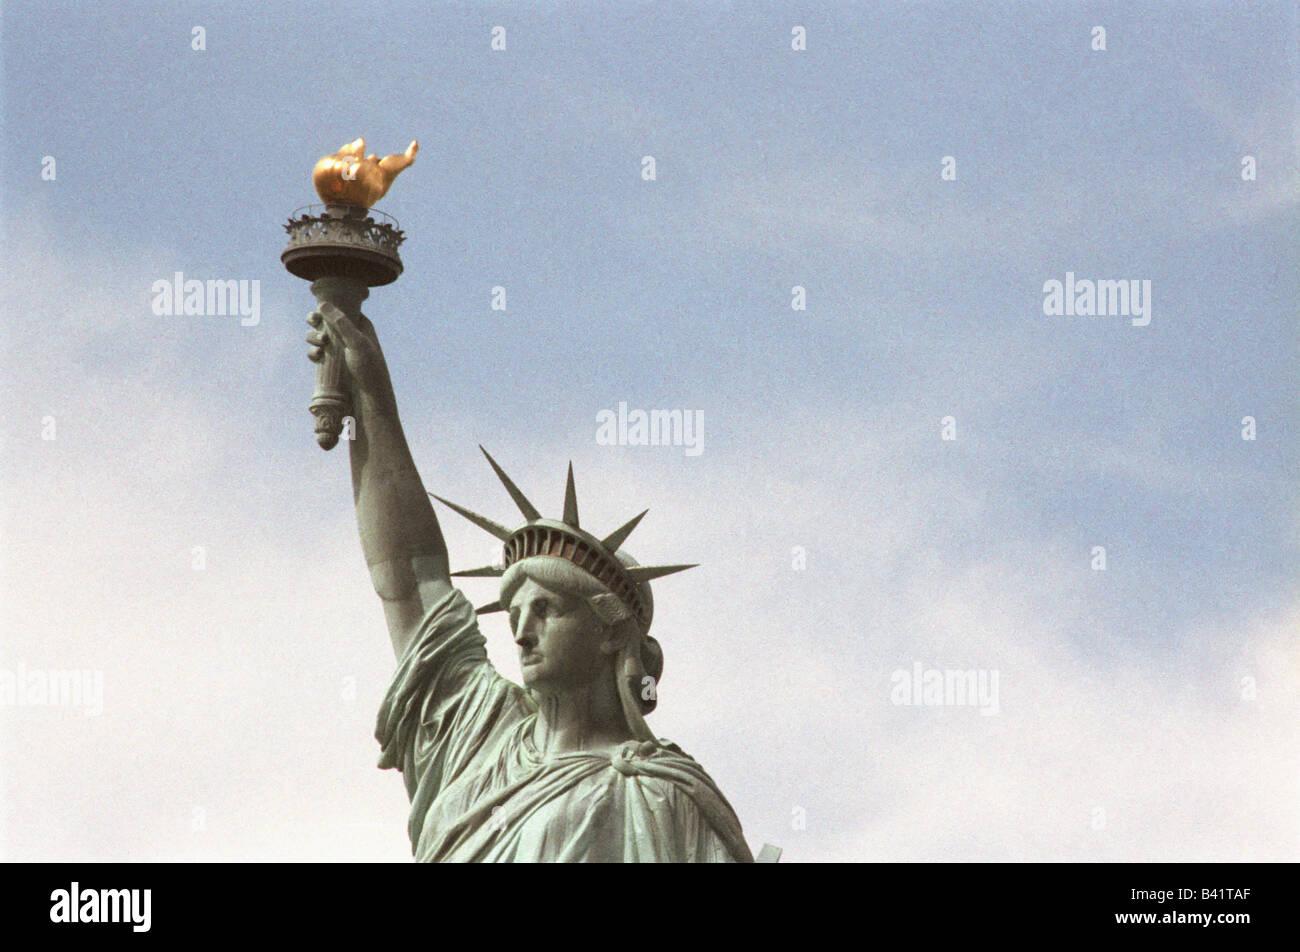 Statue Of Liberty Hand Stockfotos & Statue Of Liberty Hand Bilder ...